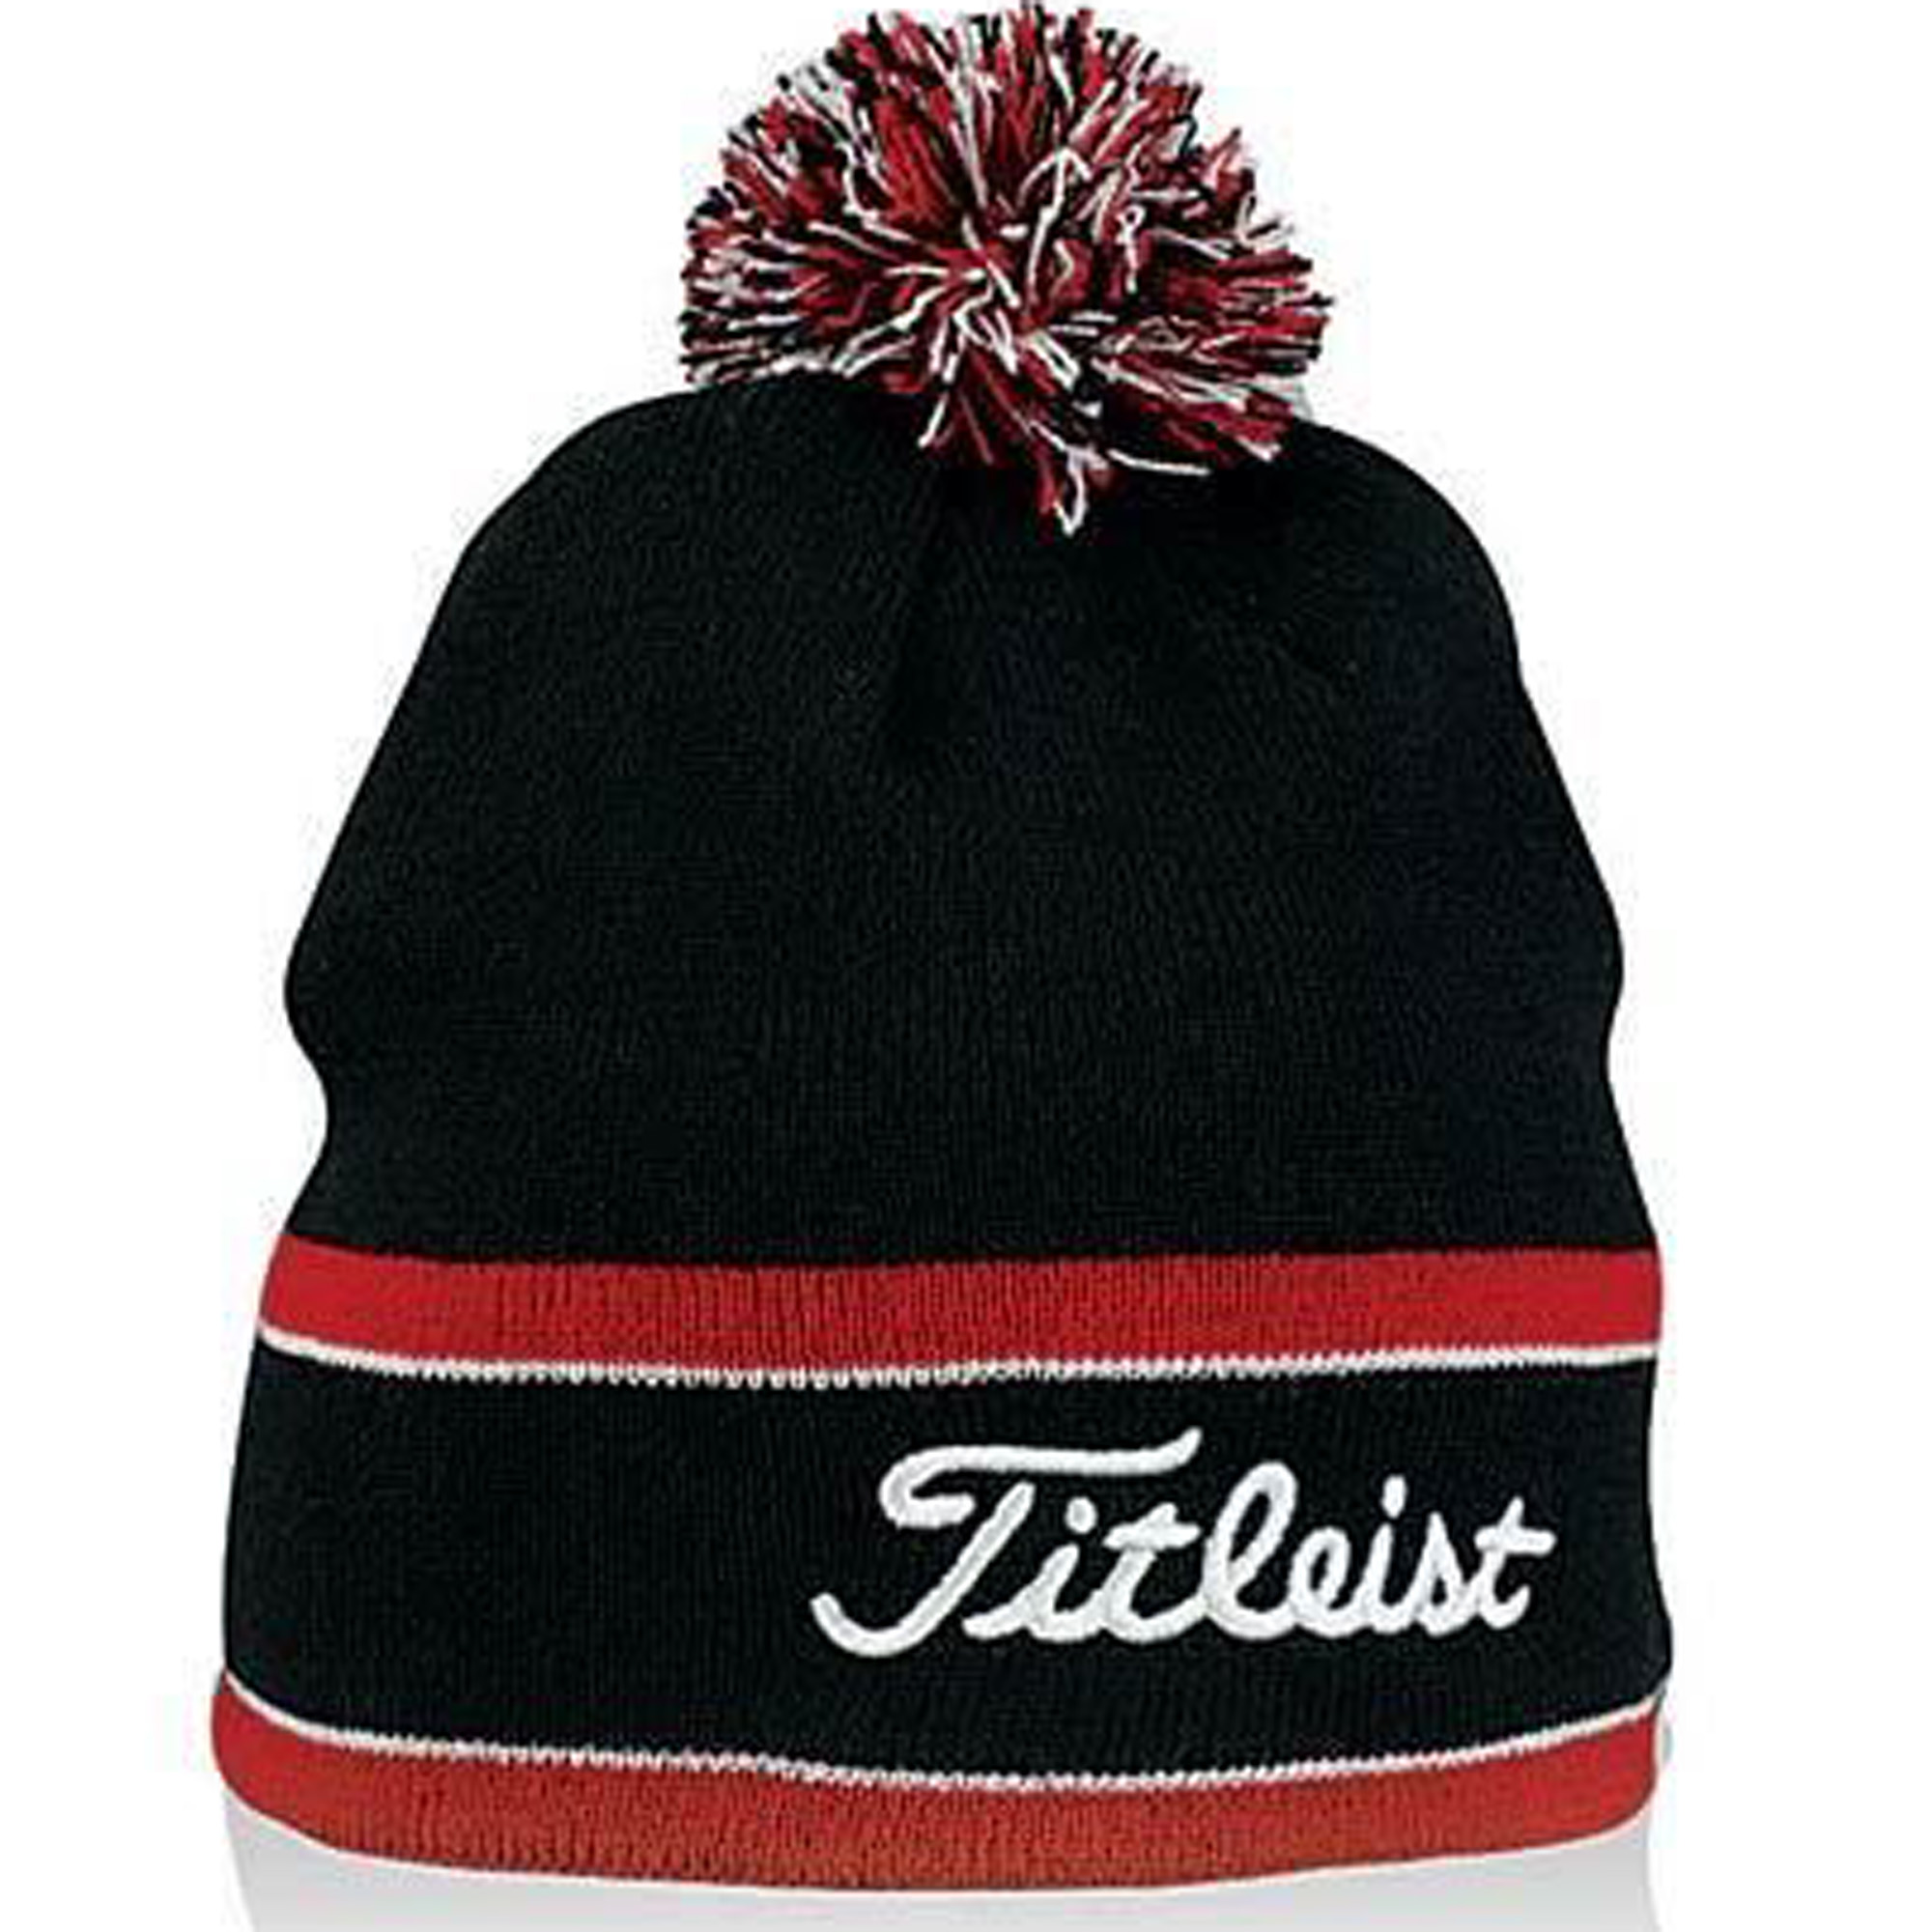 New 2014 Titleist Pom Pom Beanie Winter Hat/Cap COLOR ...